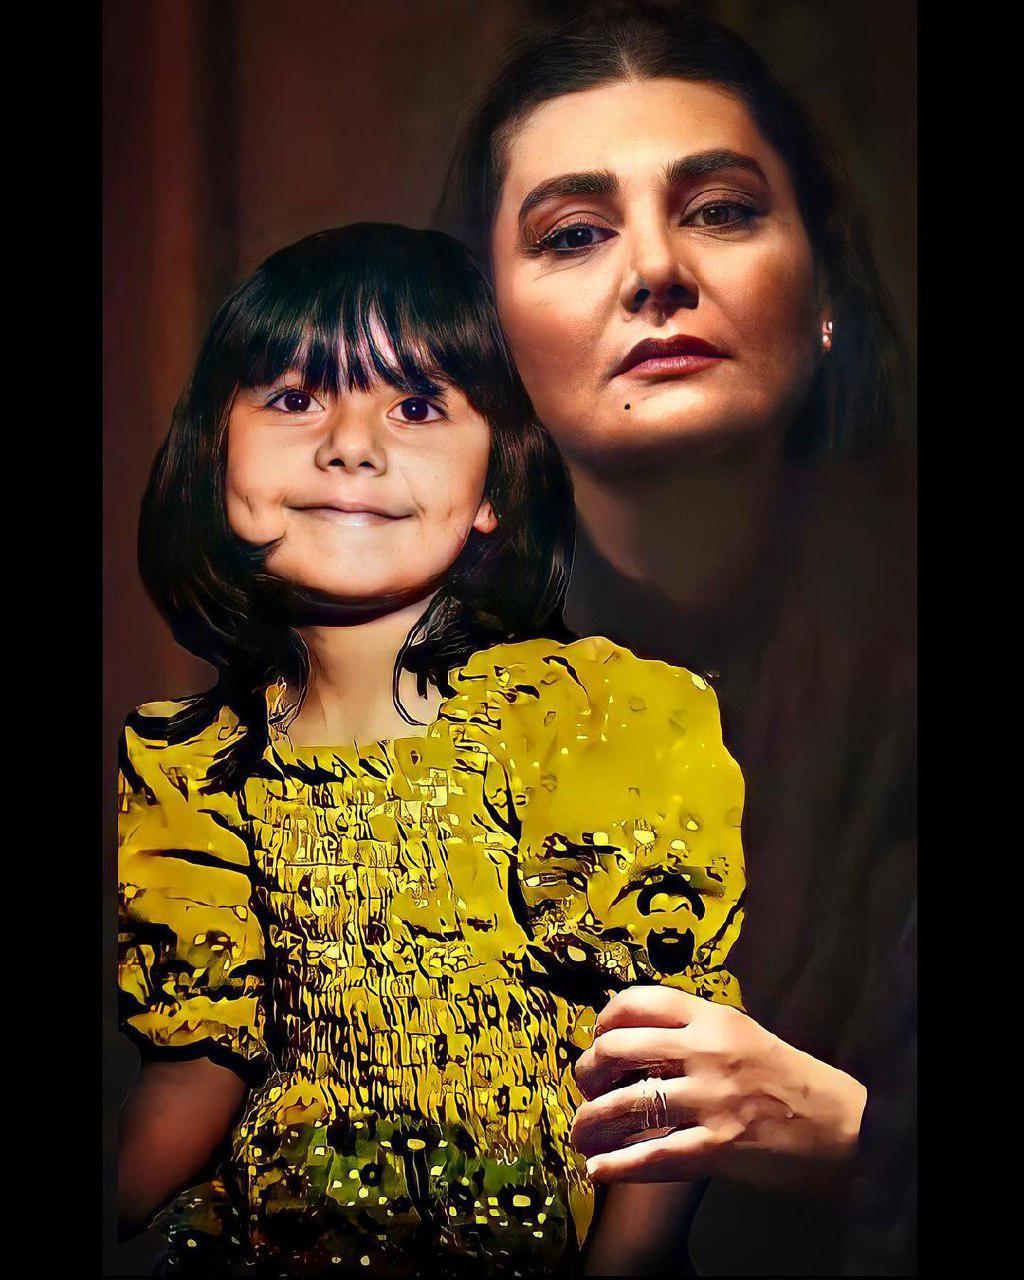 هنگامه قاضیانی در کنار کودکی اش+ عکس